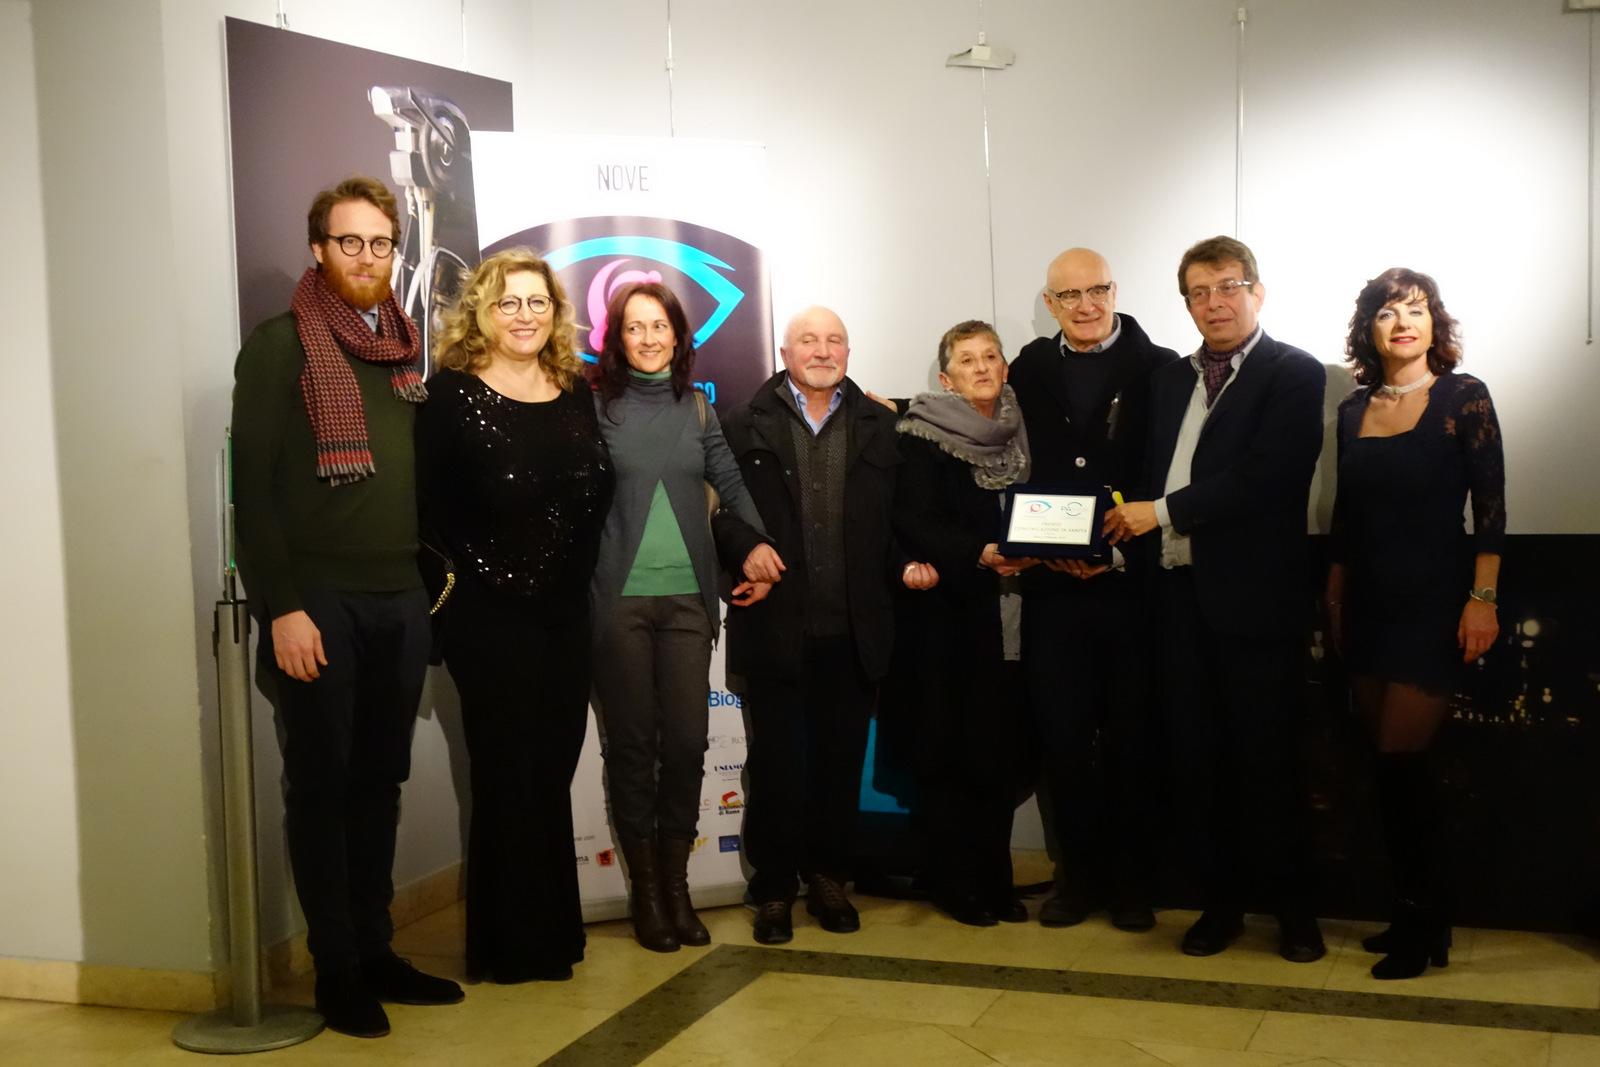 premiati al festival Uno Sguardo Raro 2019